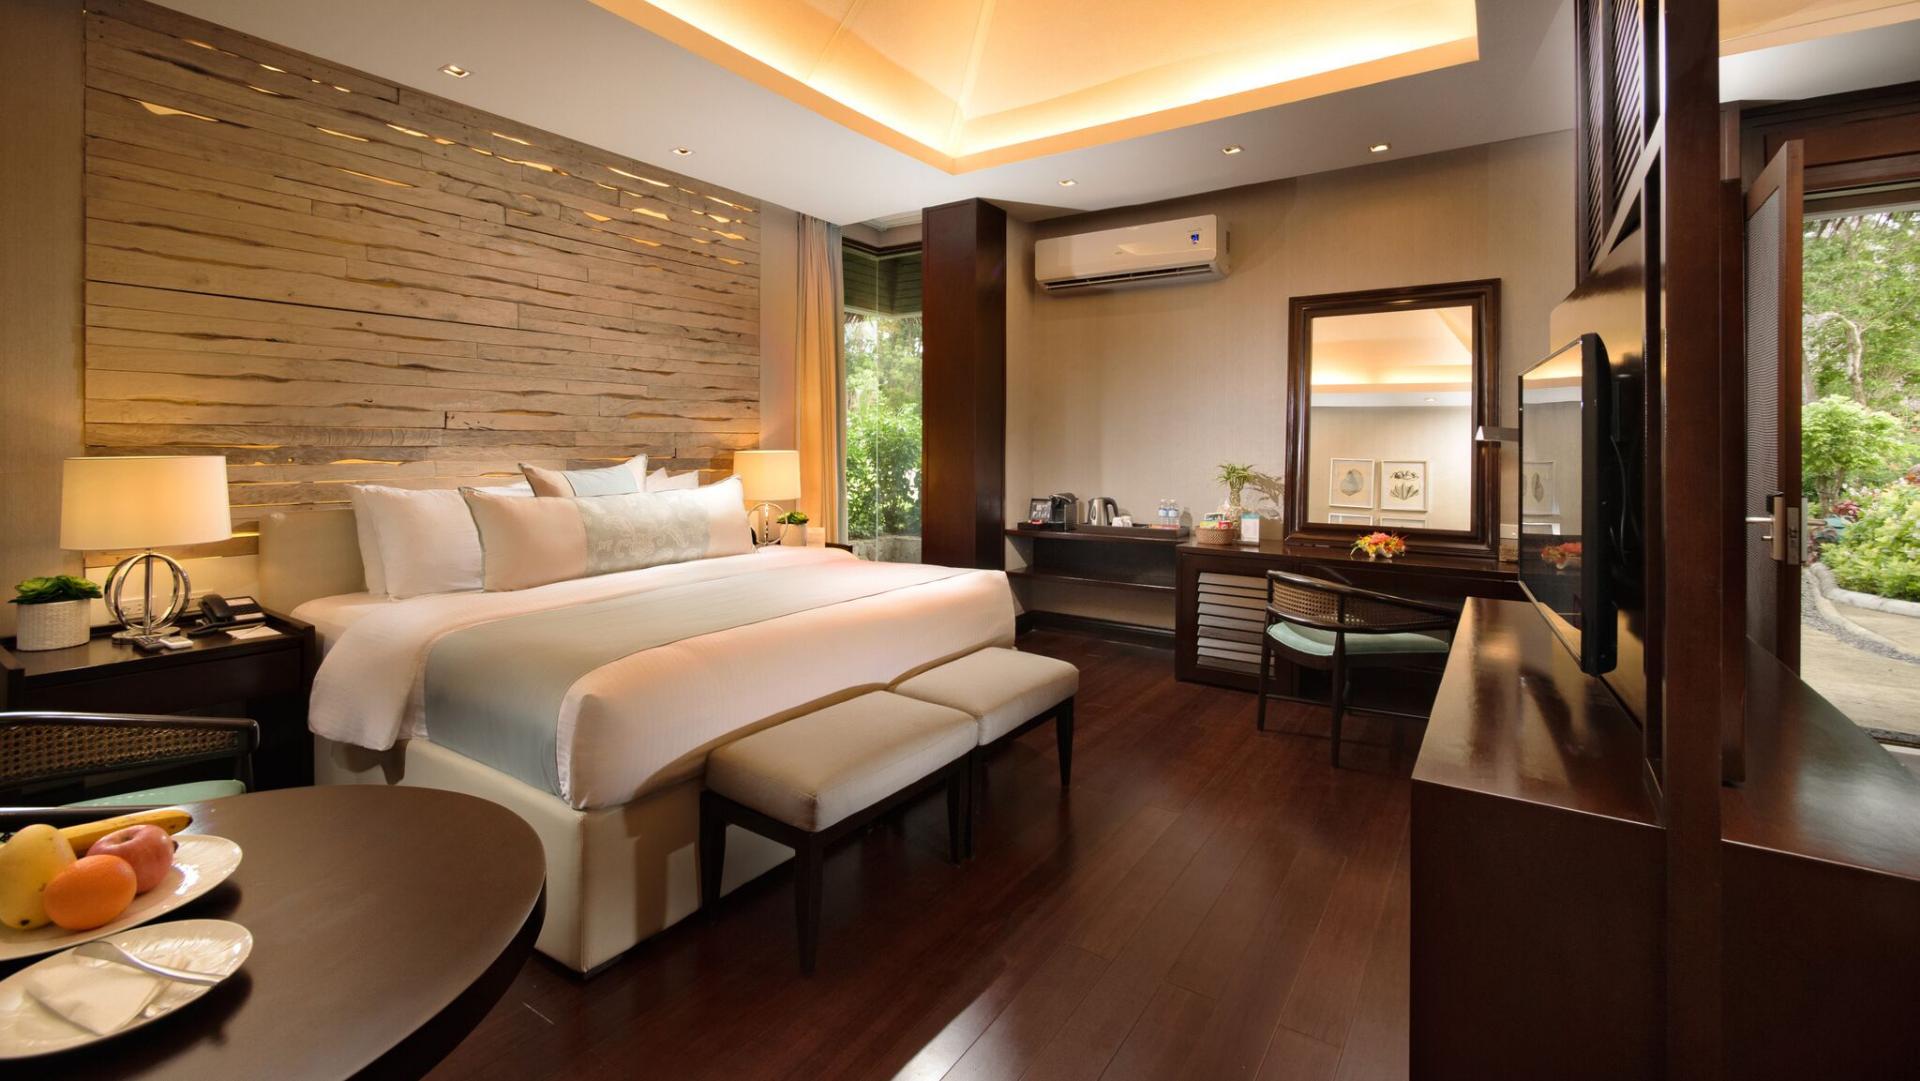 Seaview bedroom in Mithi Resort